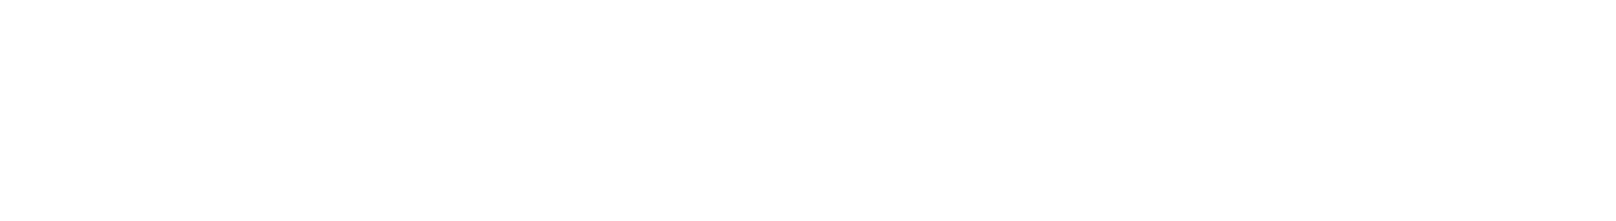 Inviatis - Agence webmarketing à Agen (47000)